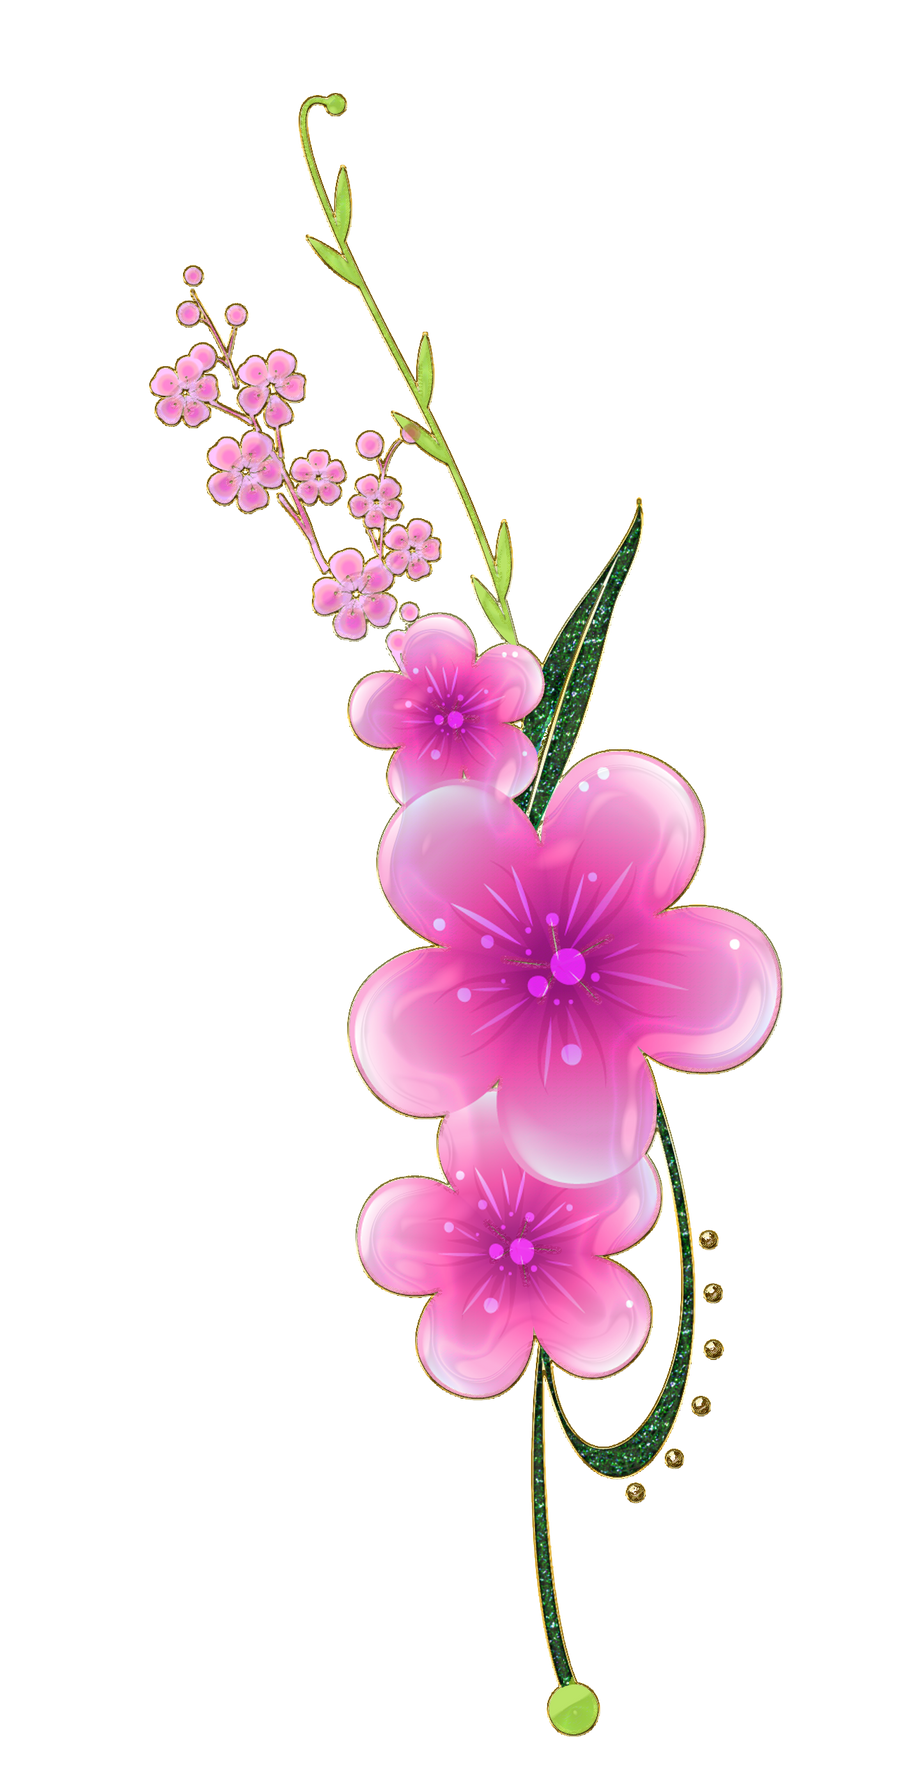 sweet pink flowers png by Melissa-tm on DeviantArt